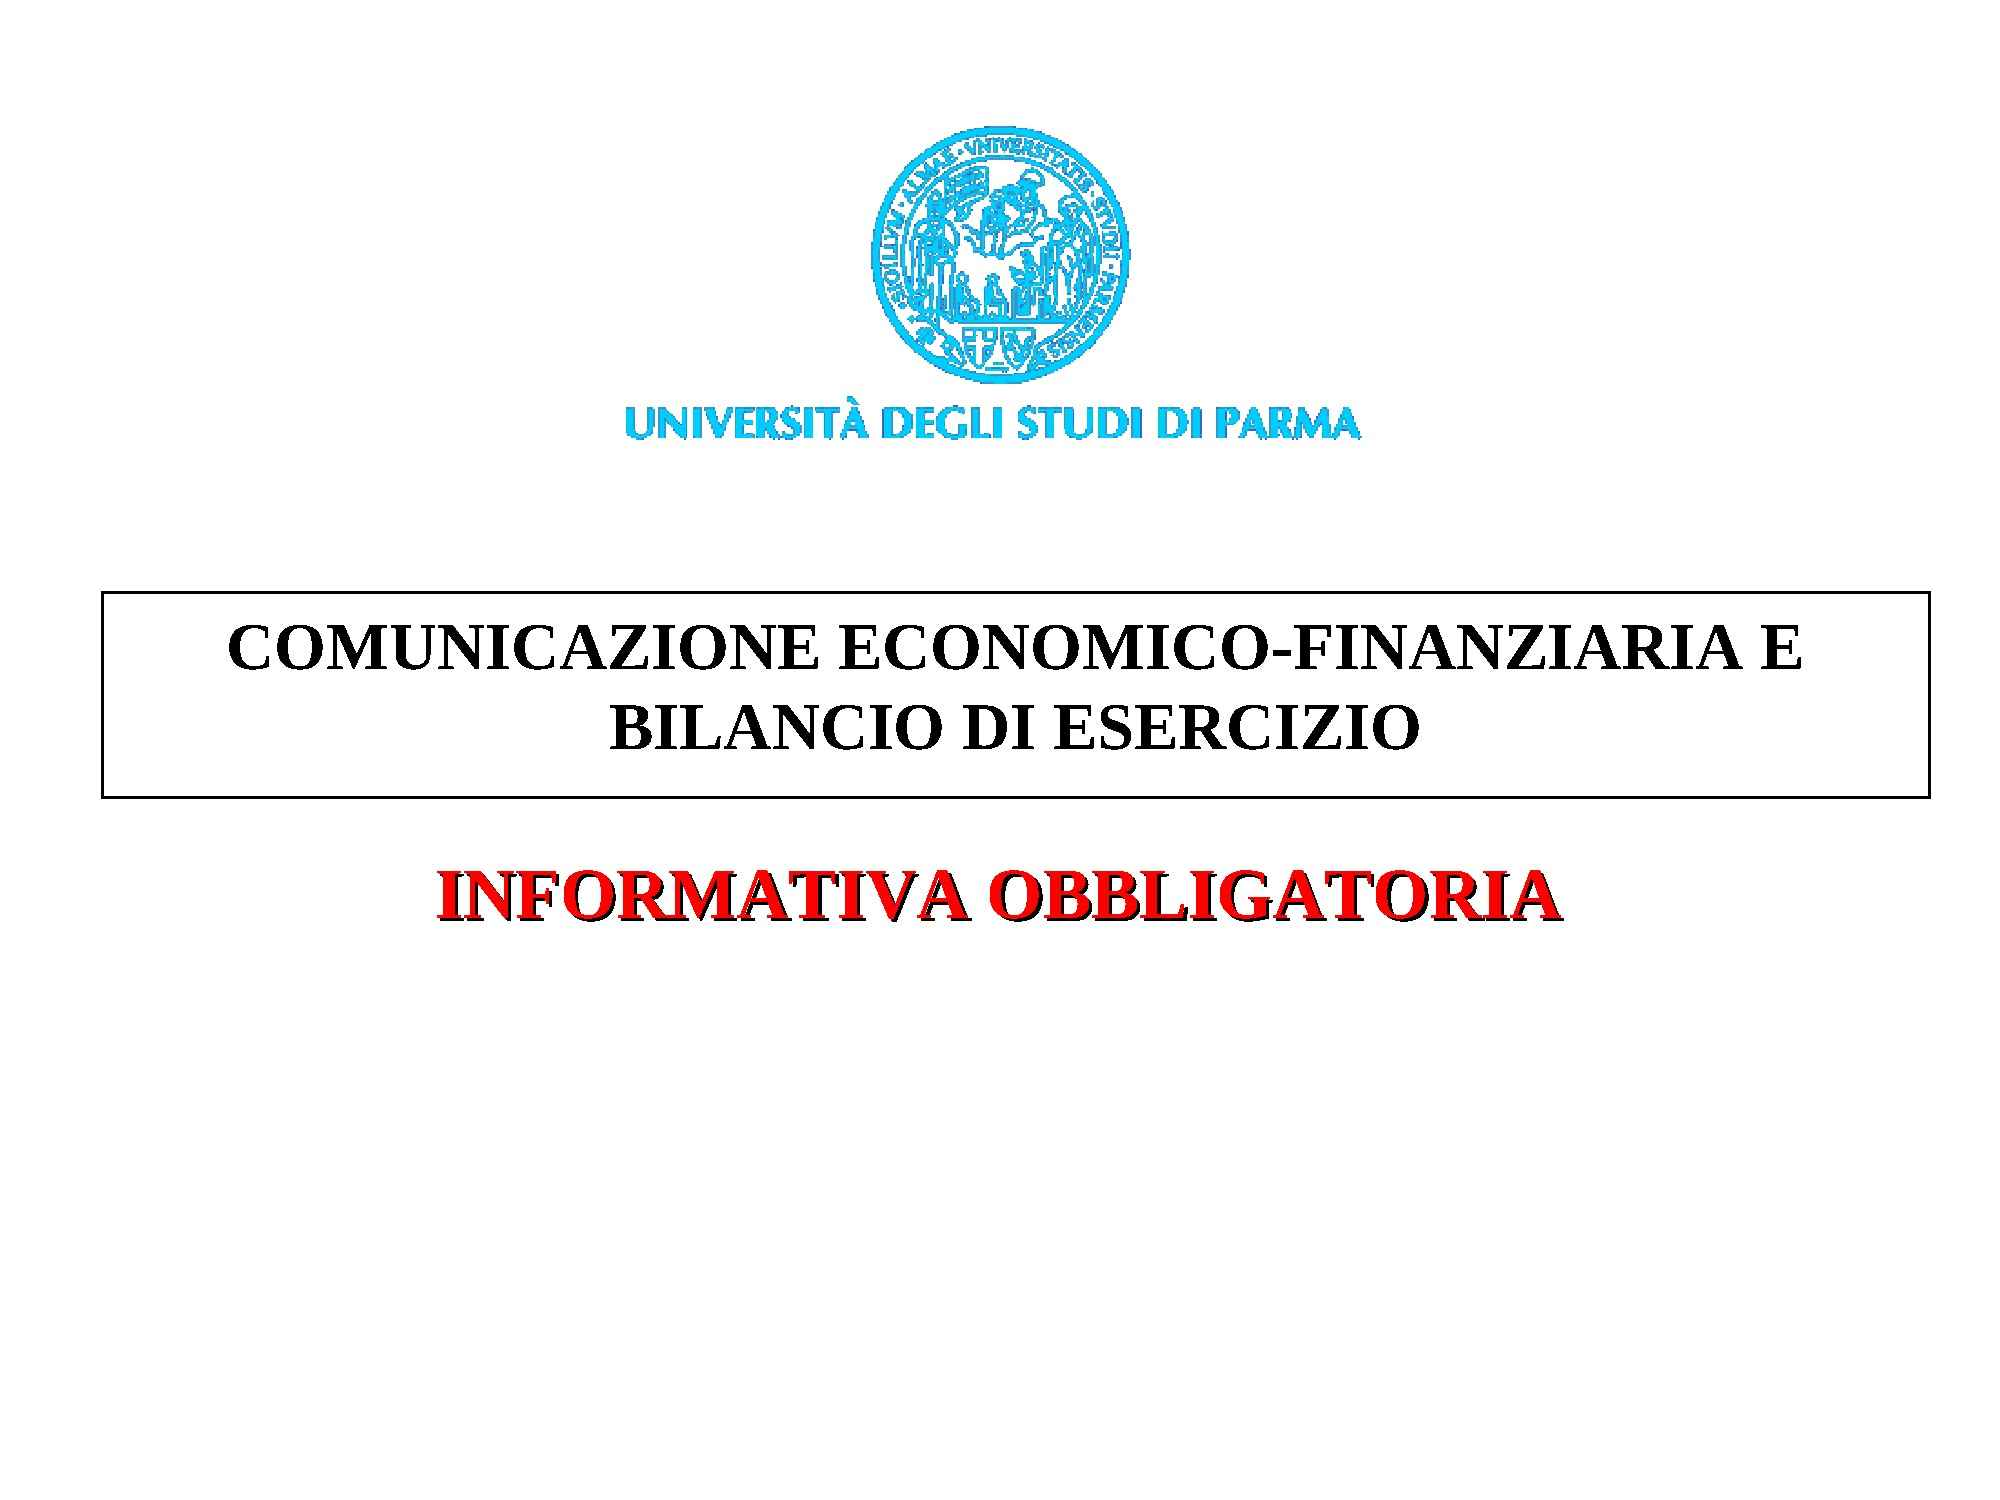 Informativa obbligatoria